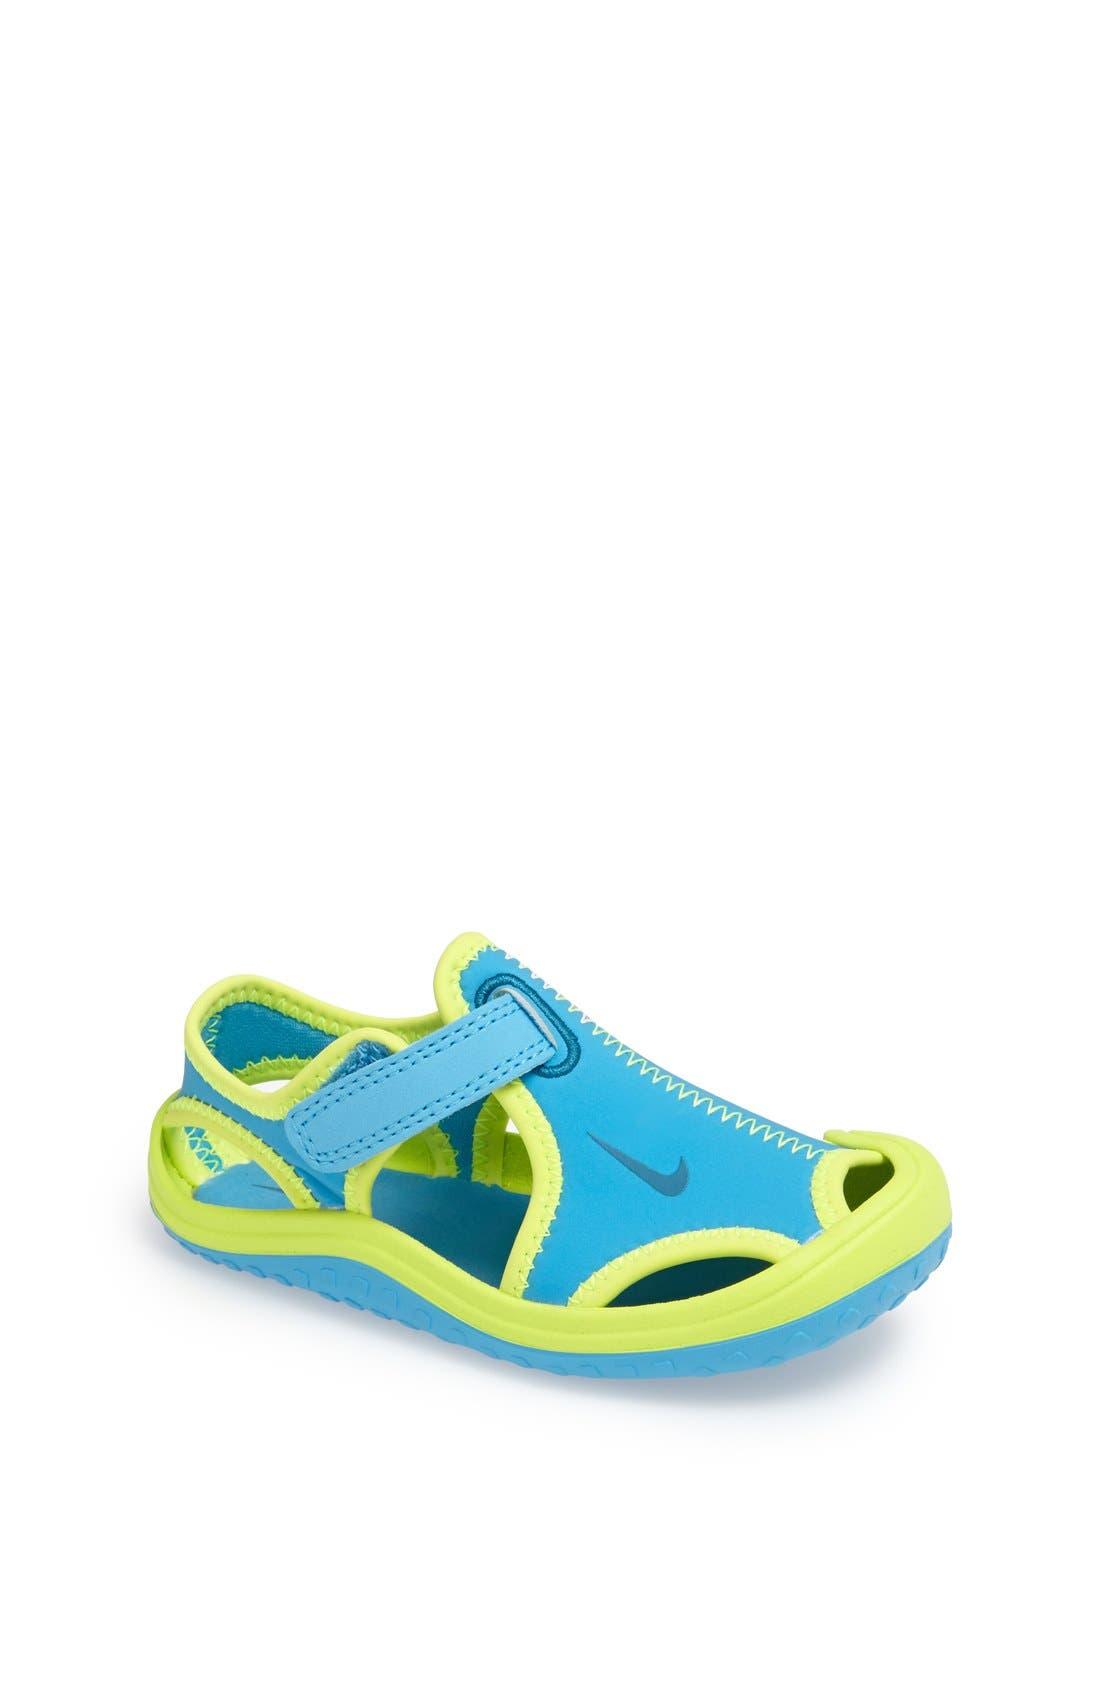 Main Image - Nike 'Sunray Protect' Sandal (Baby, Walker, Toddler & Little Kid)